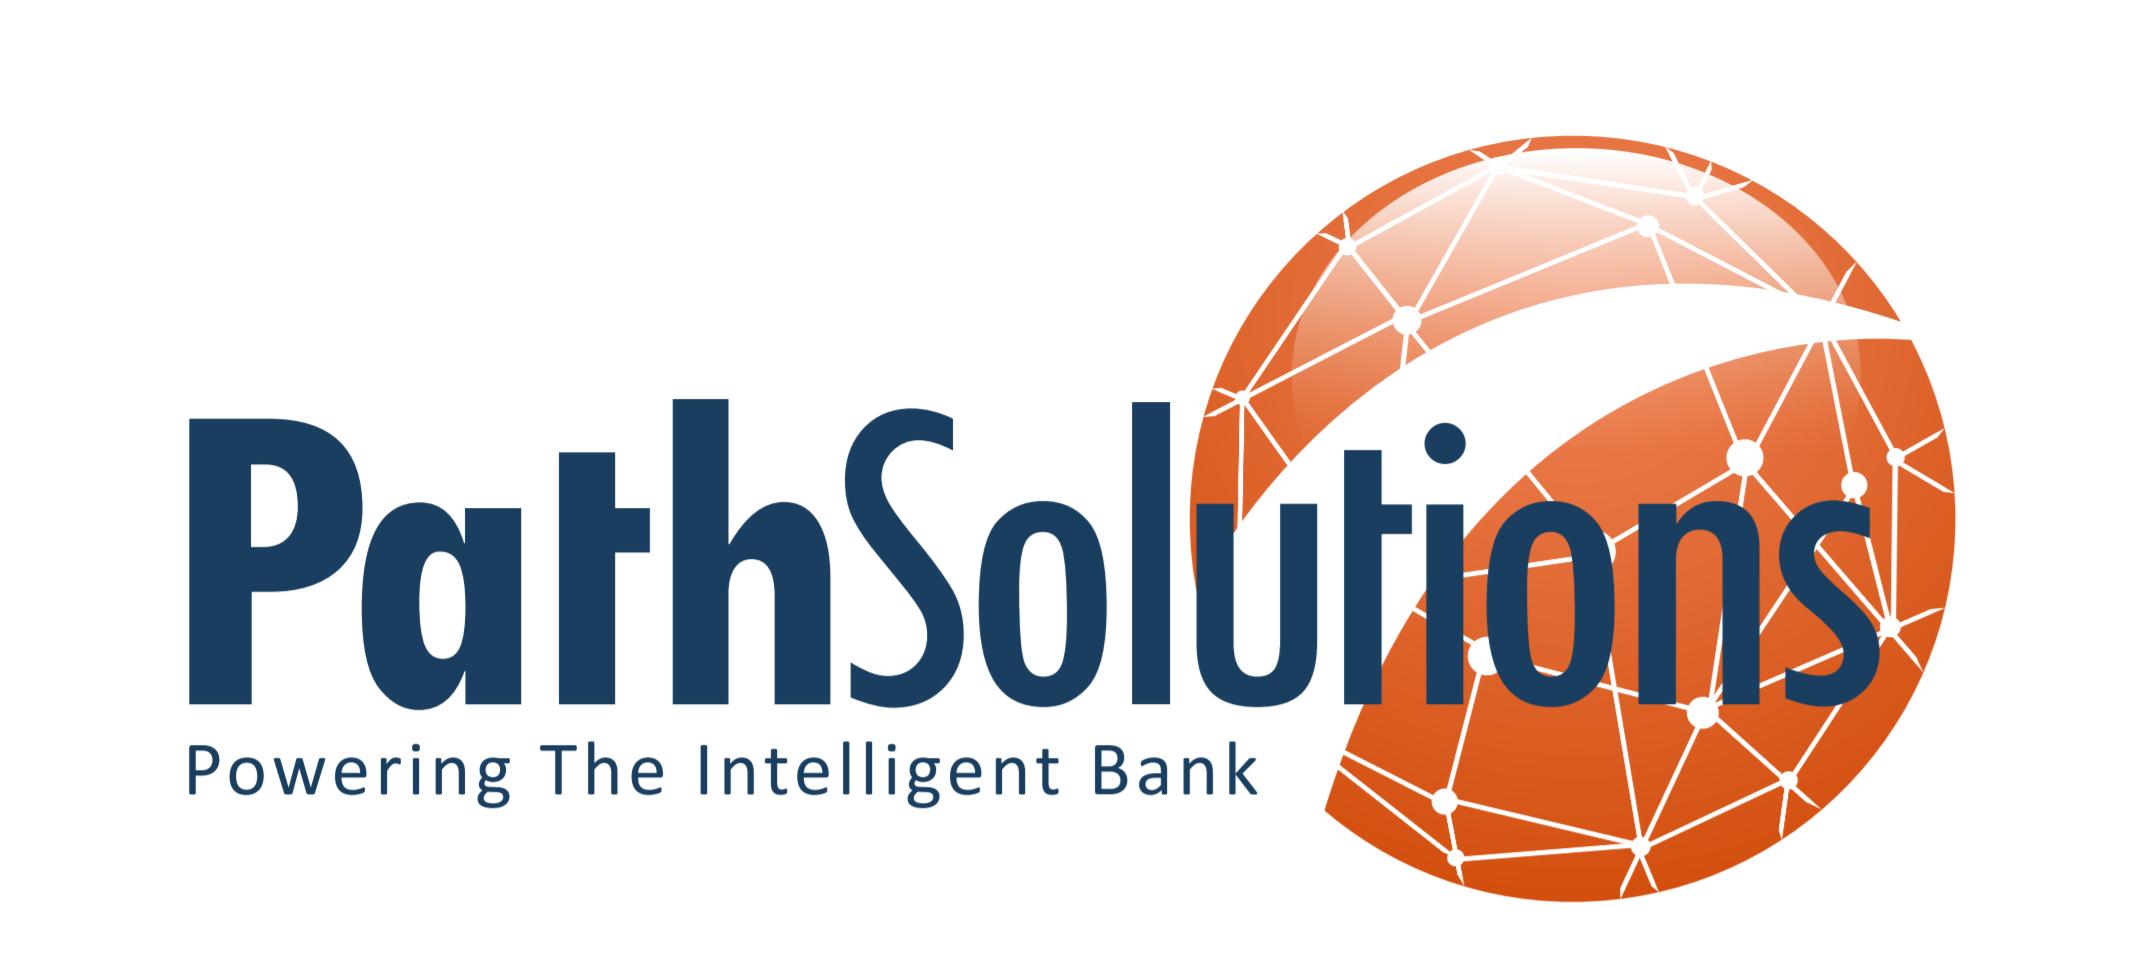 Path Solutions selected as 2015 GIFA award recipient